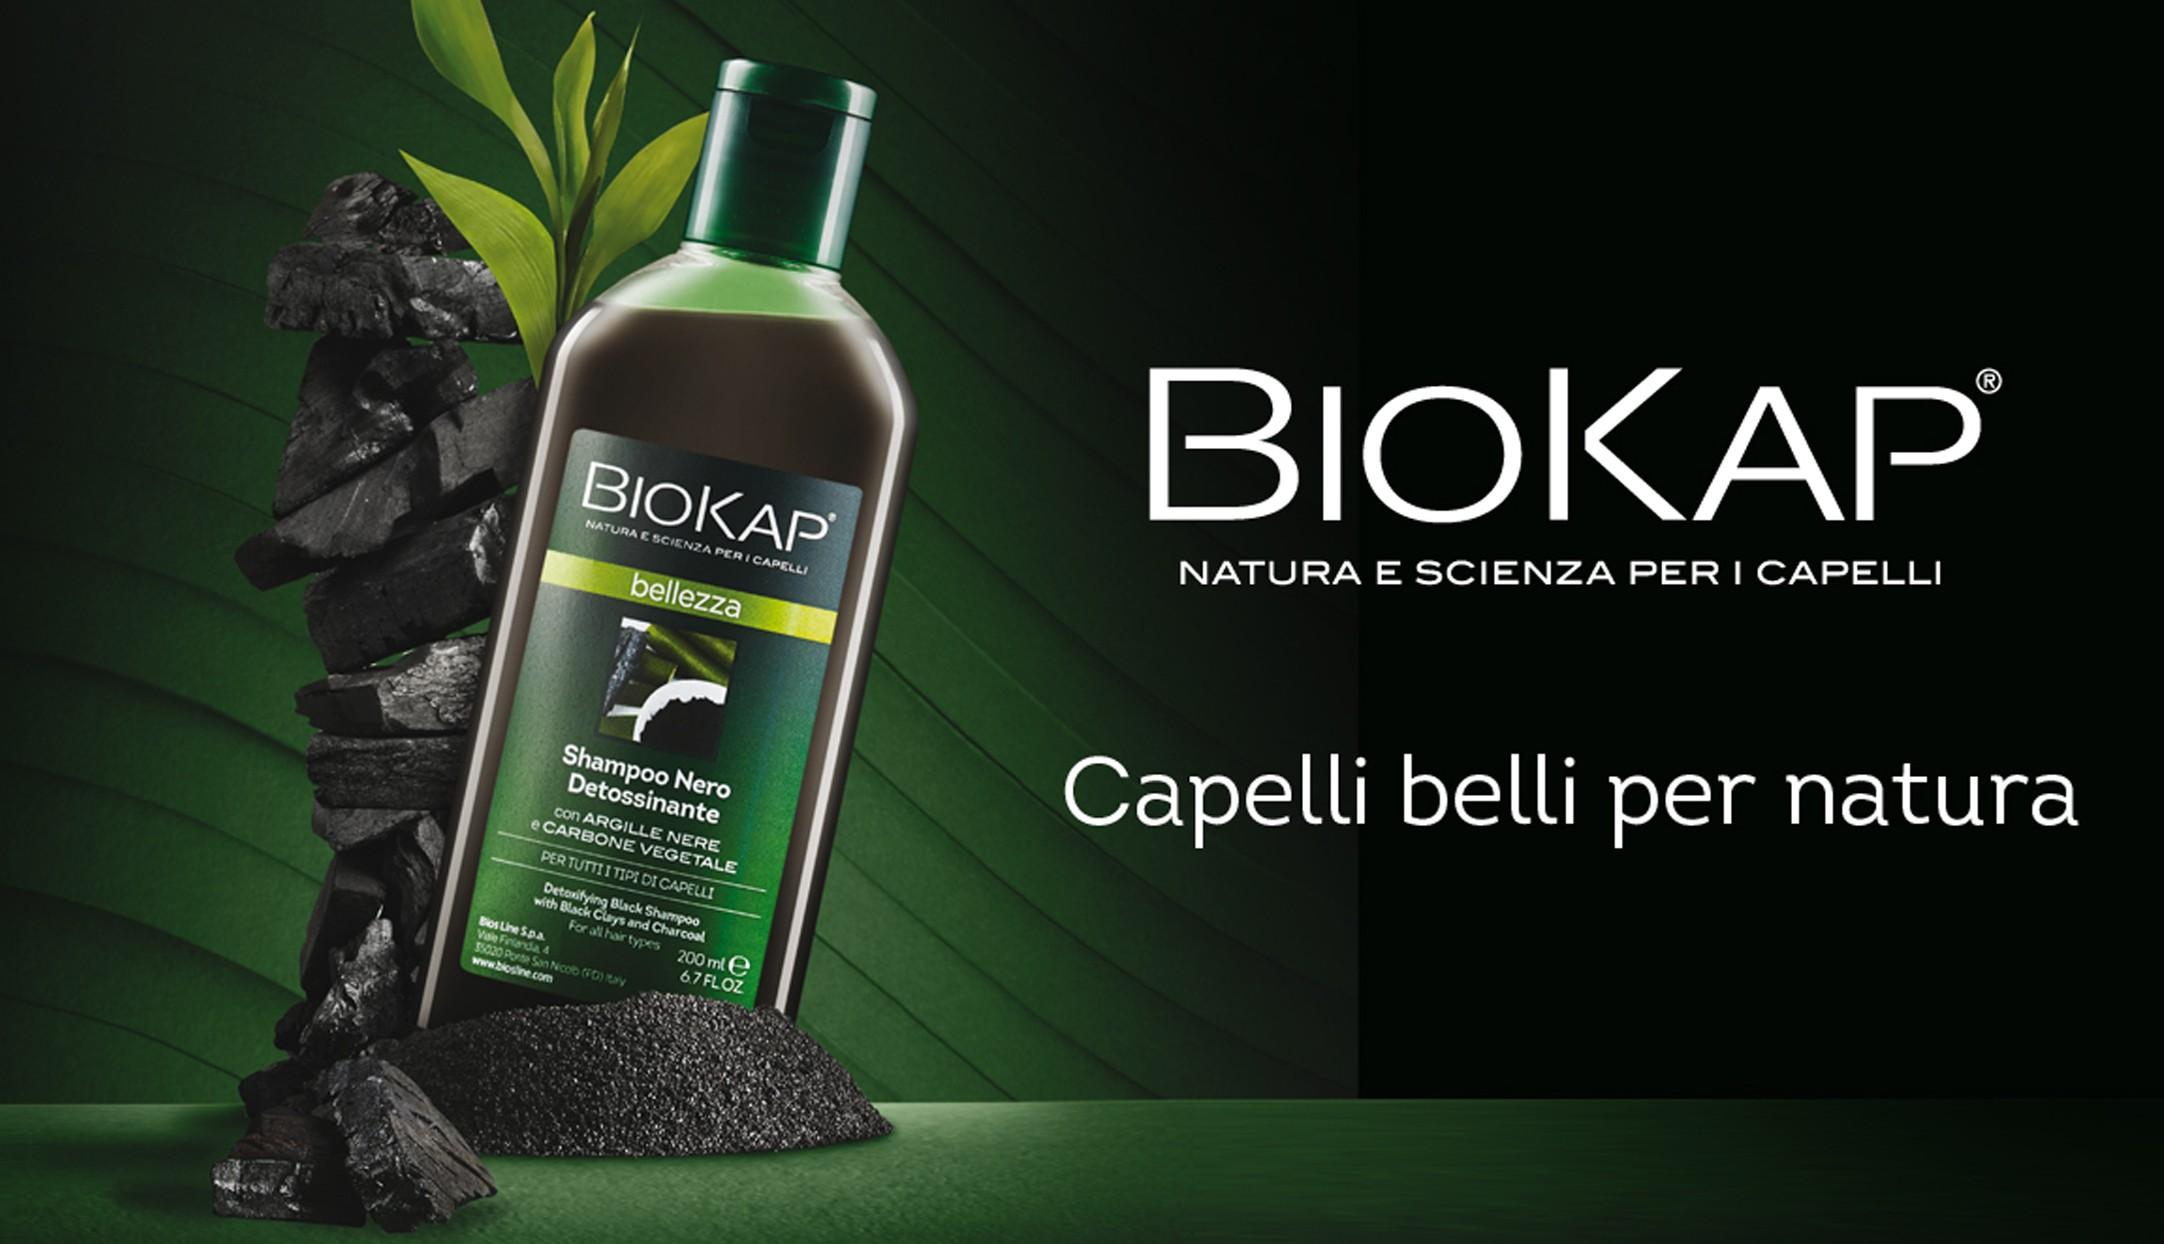 Biokap - Natura e Scienza per i capelli